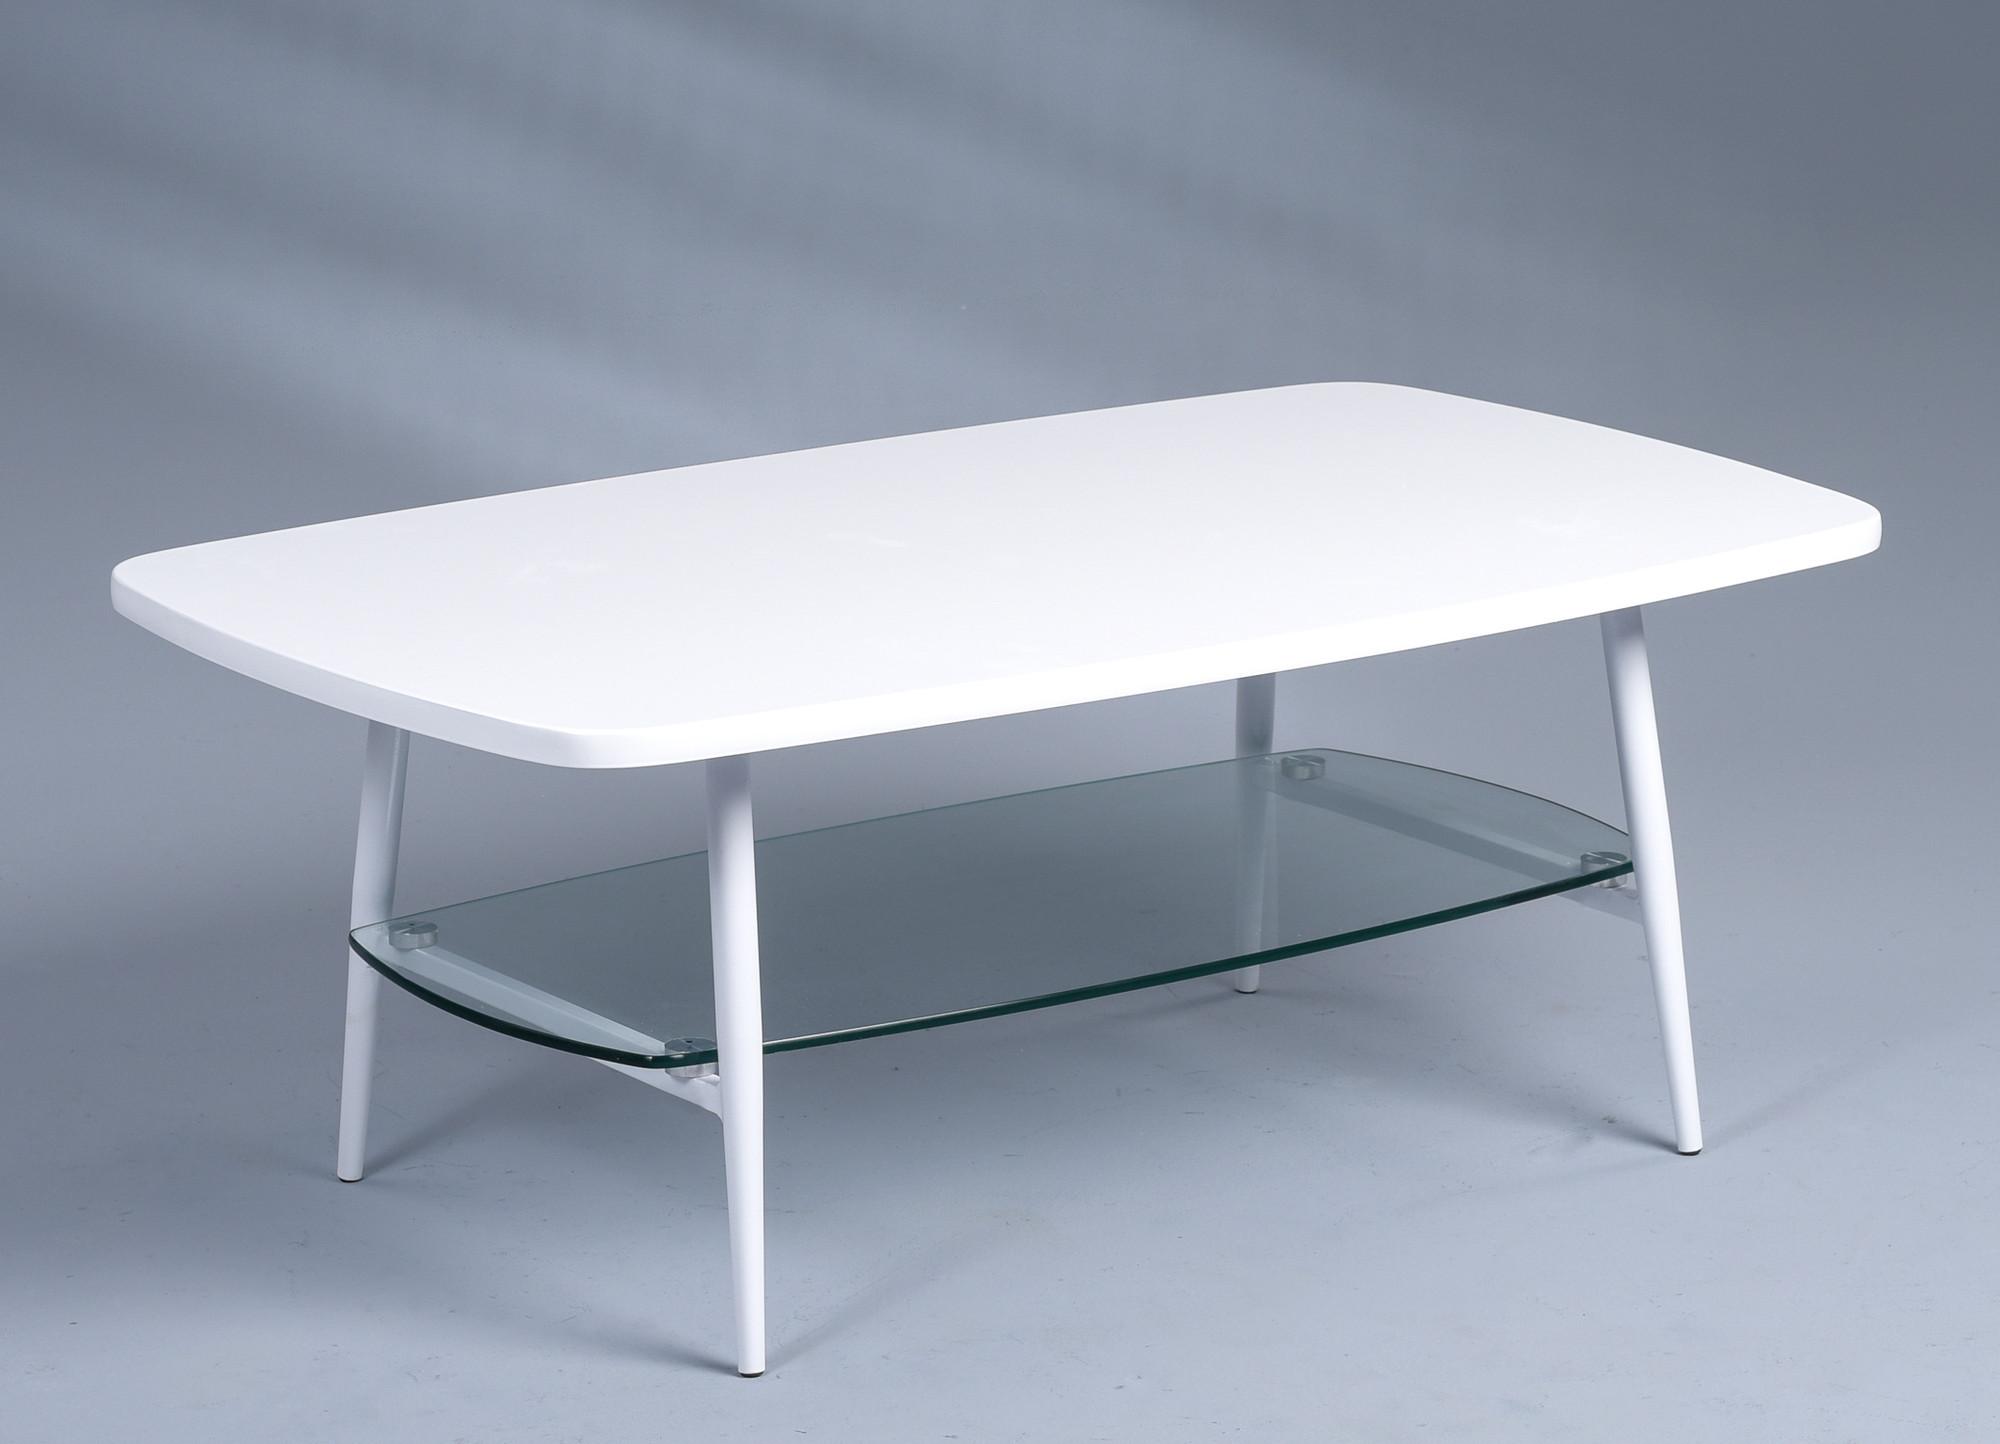 couchtisch girona 100x38x60 mdf glas metall. Black Bedroom Furniture Sets. Home Design Ideas